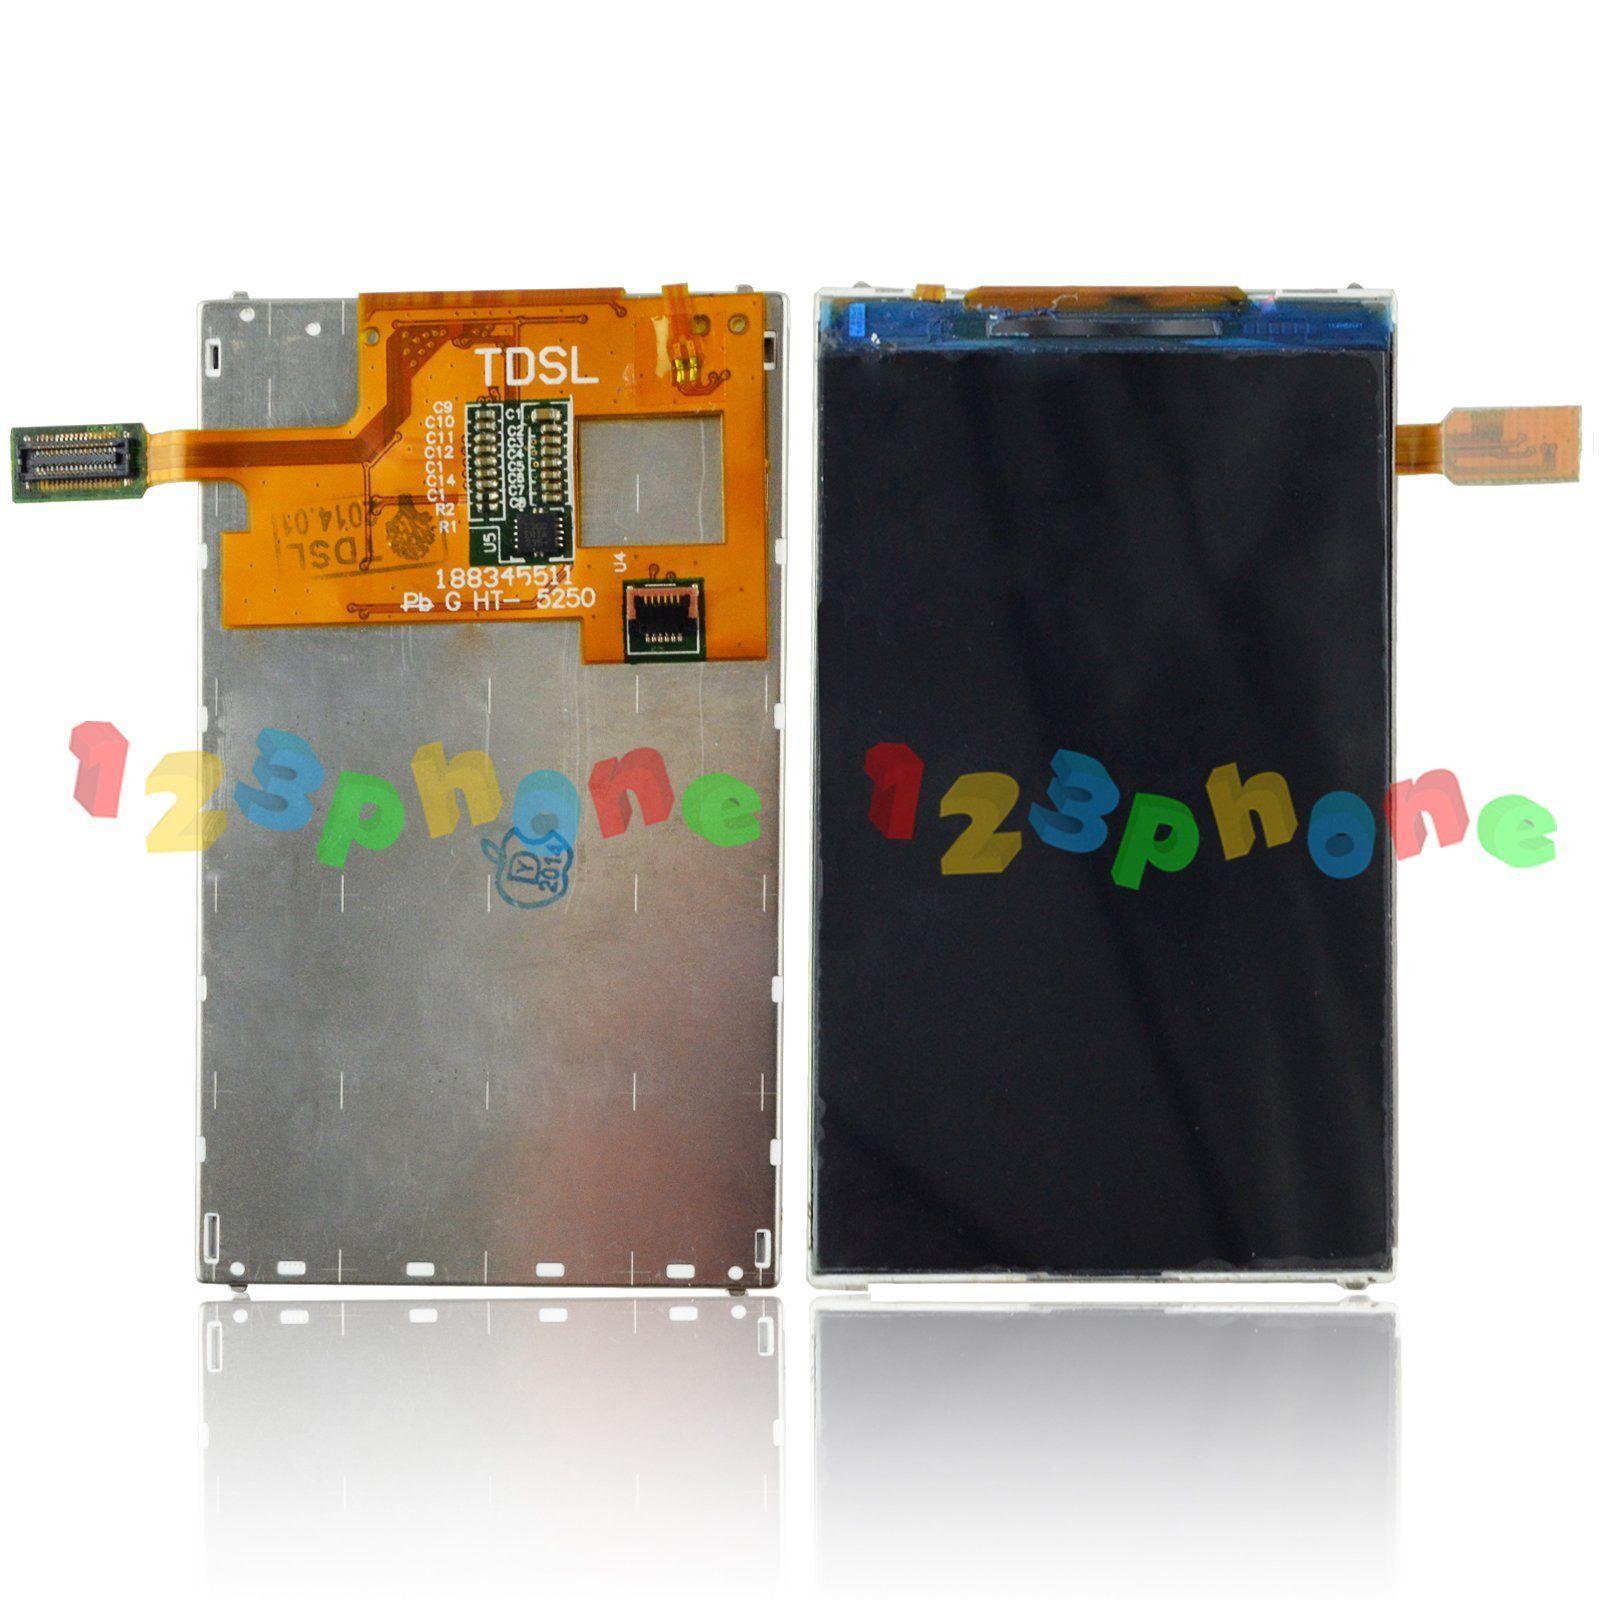 brand new lcd screen display for samsung wave 525 s5250 ebay rh ebay com Samsung Refrigerator Manual Samsung Refrigerator Troubleshooting Guide